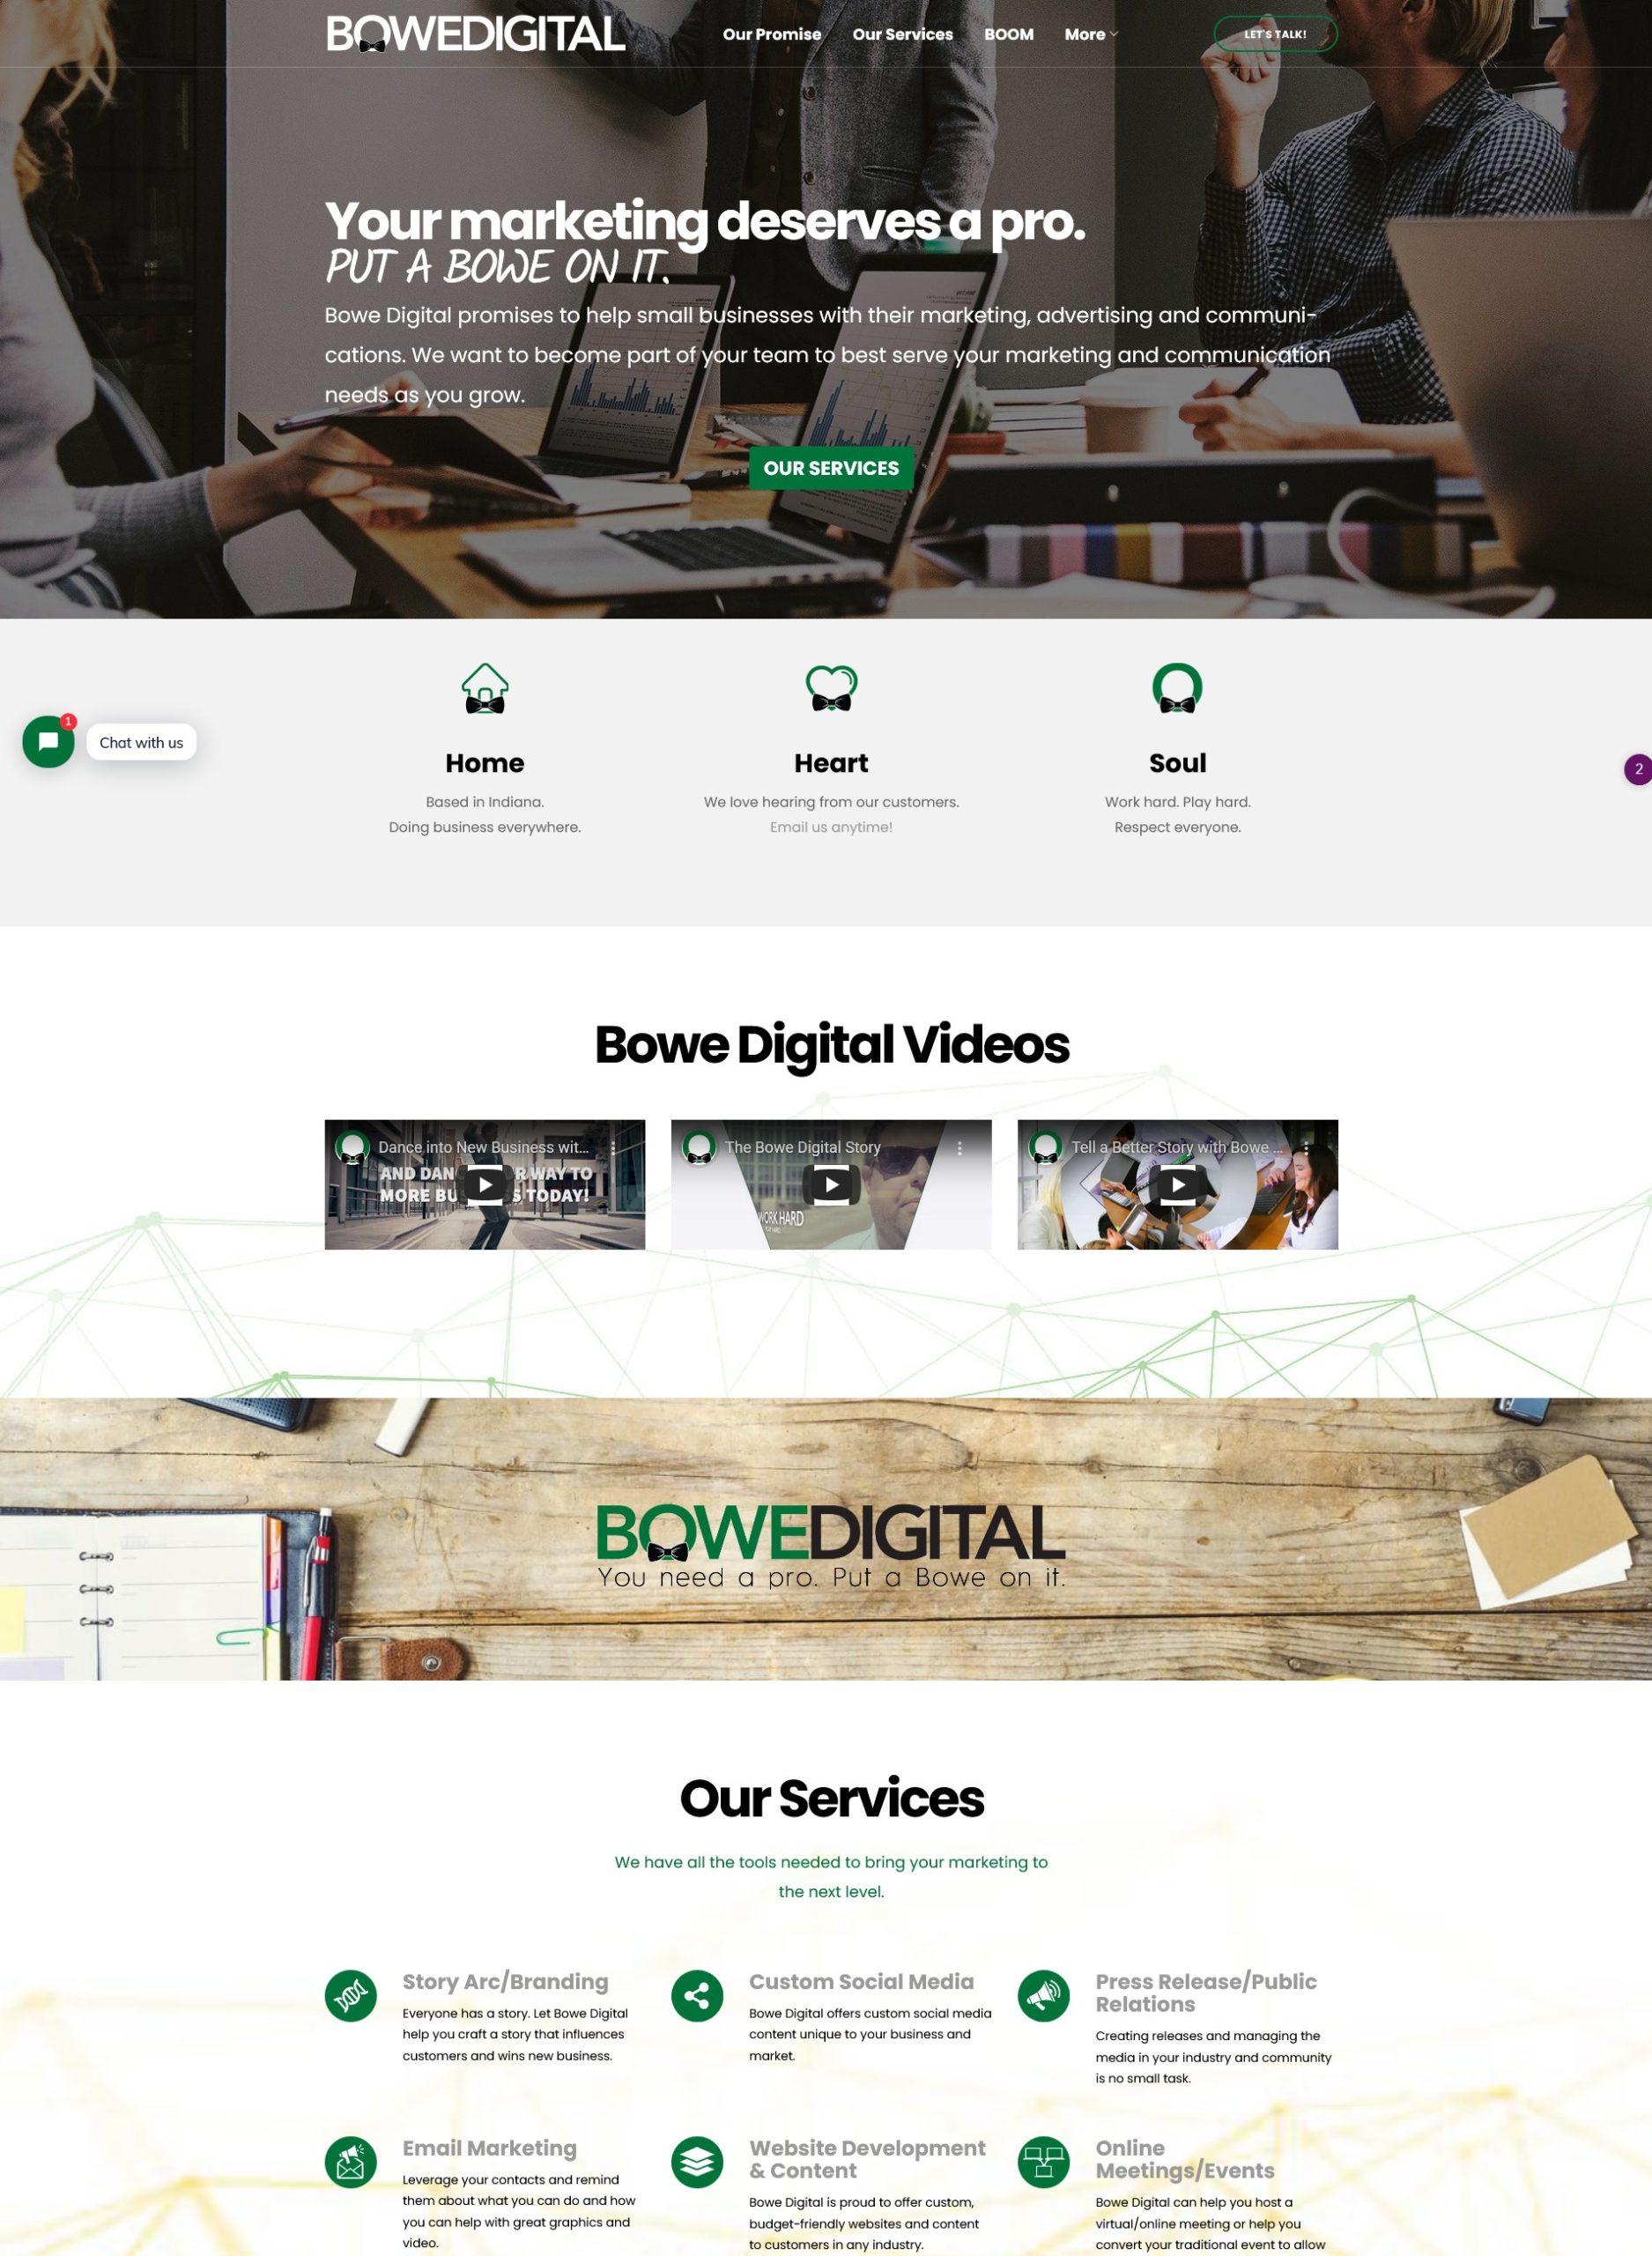 Bowe Digital